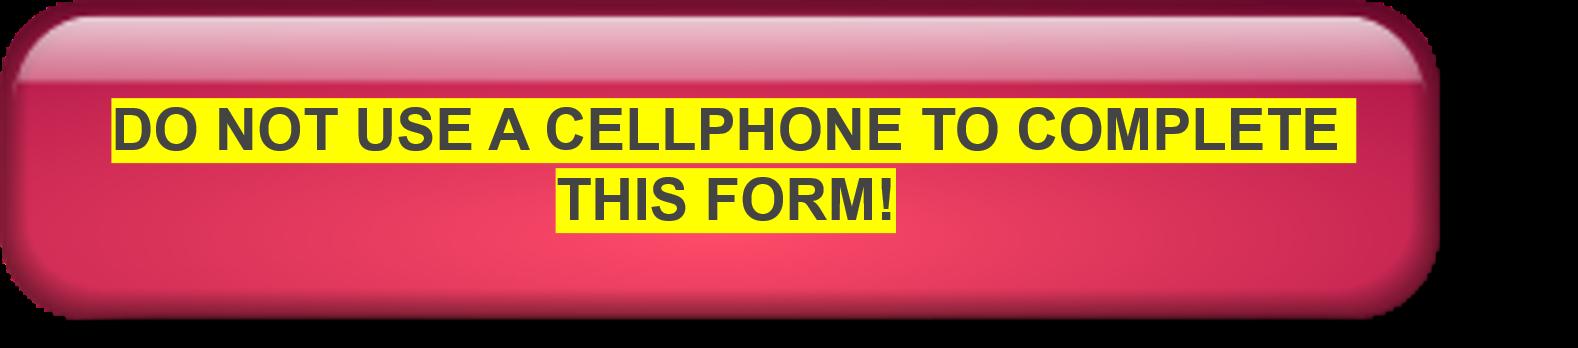 CELLPHONE WARNING